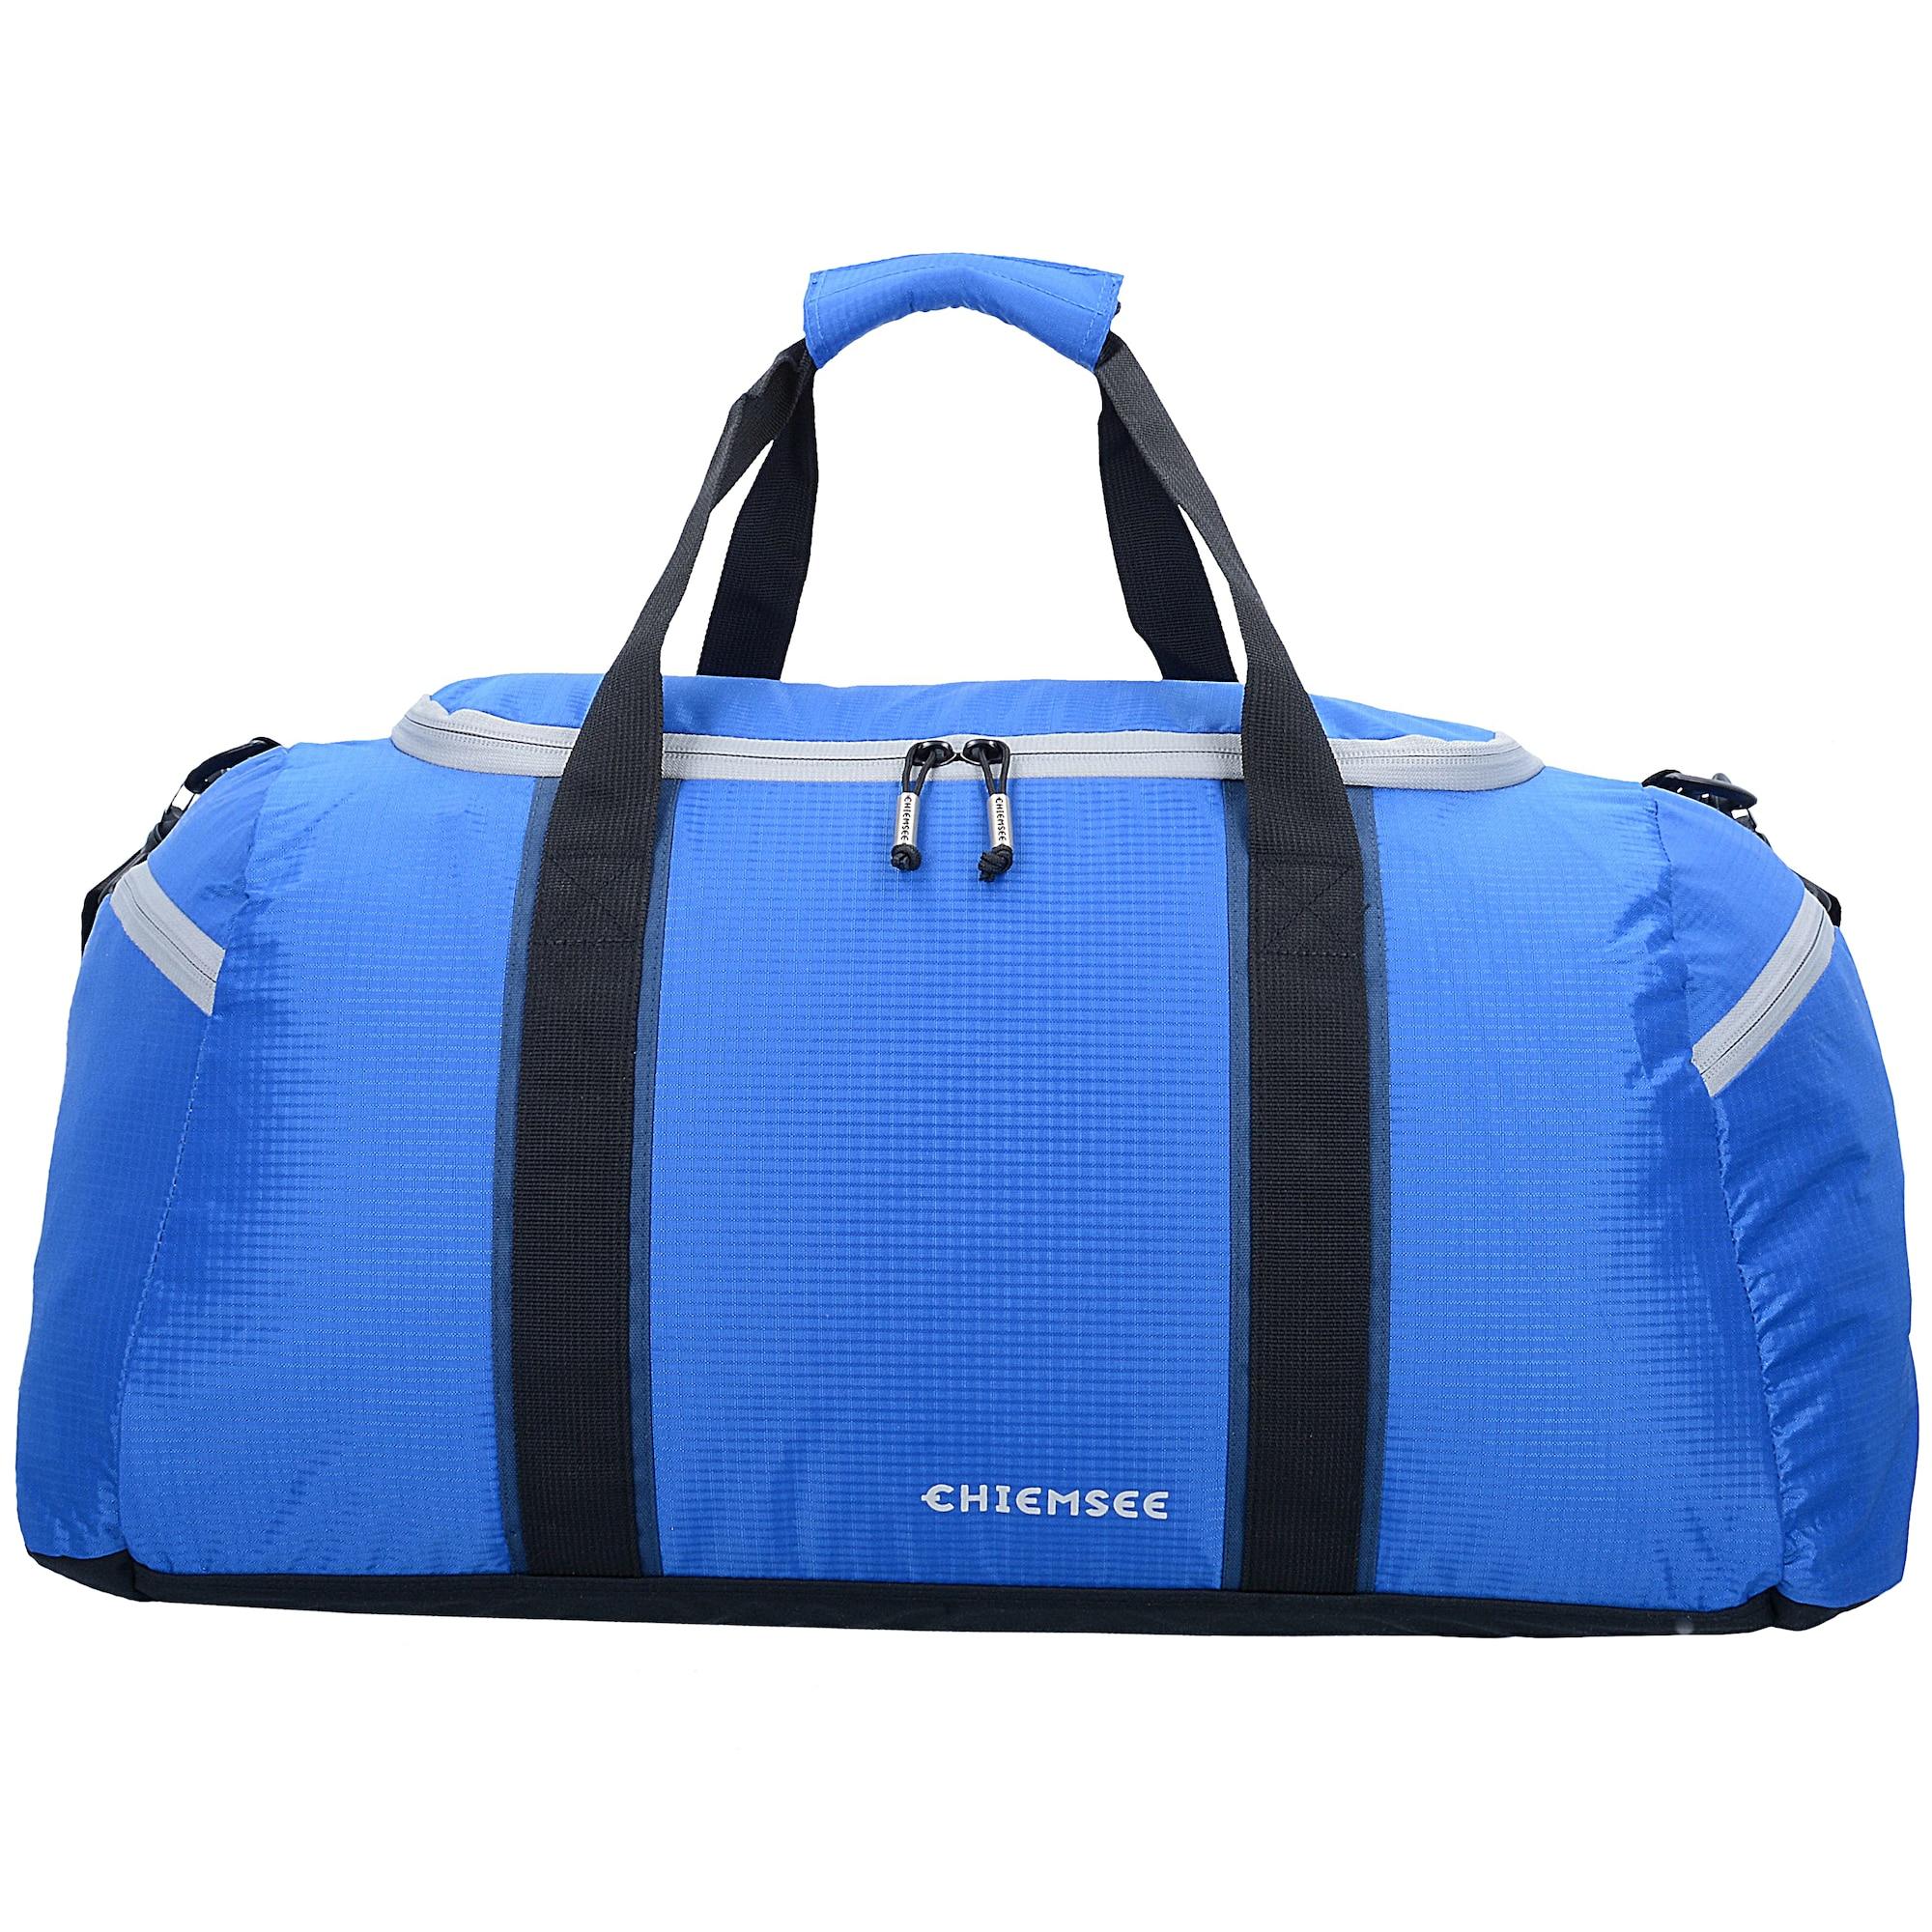 CHIEMSEE, Dames Sporttas 'Matchbag Large', blauw / gemengde kleuren